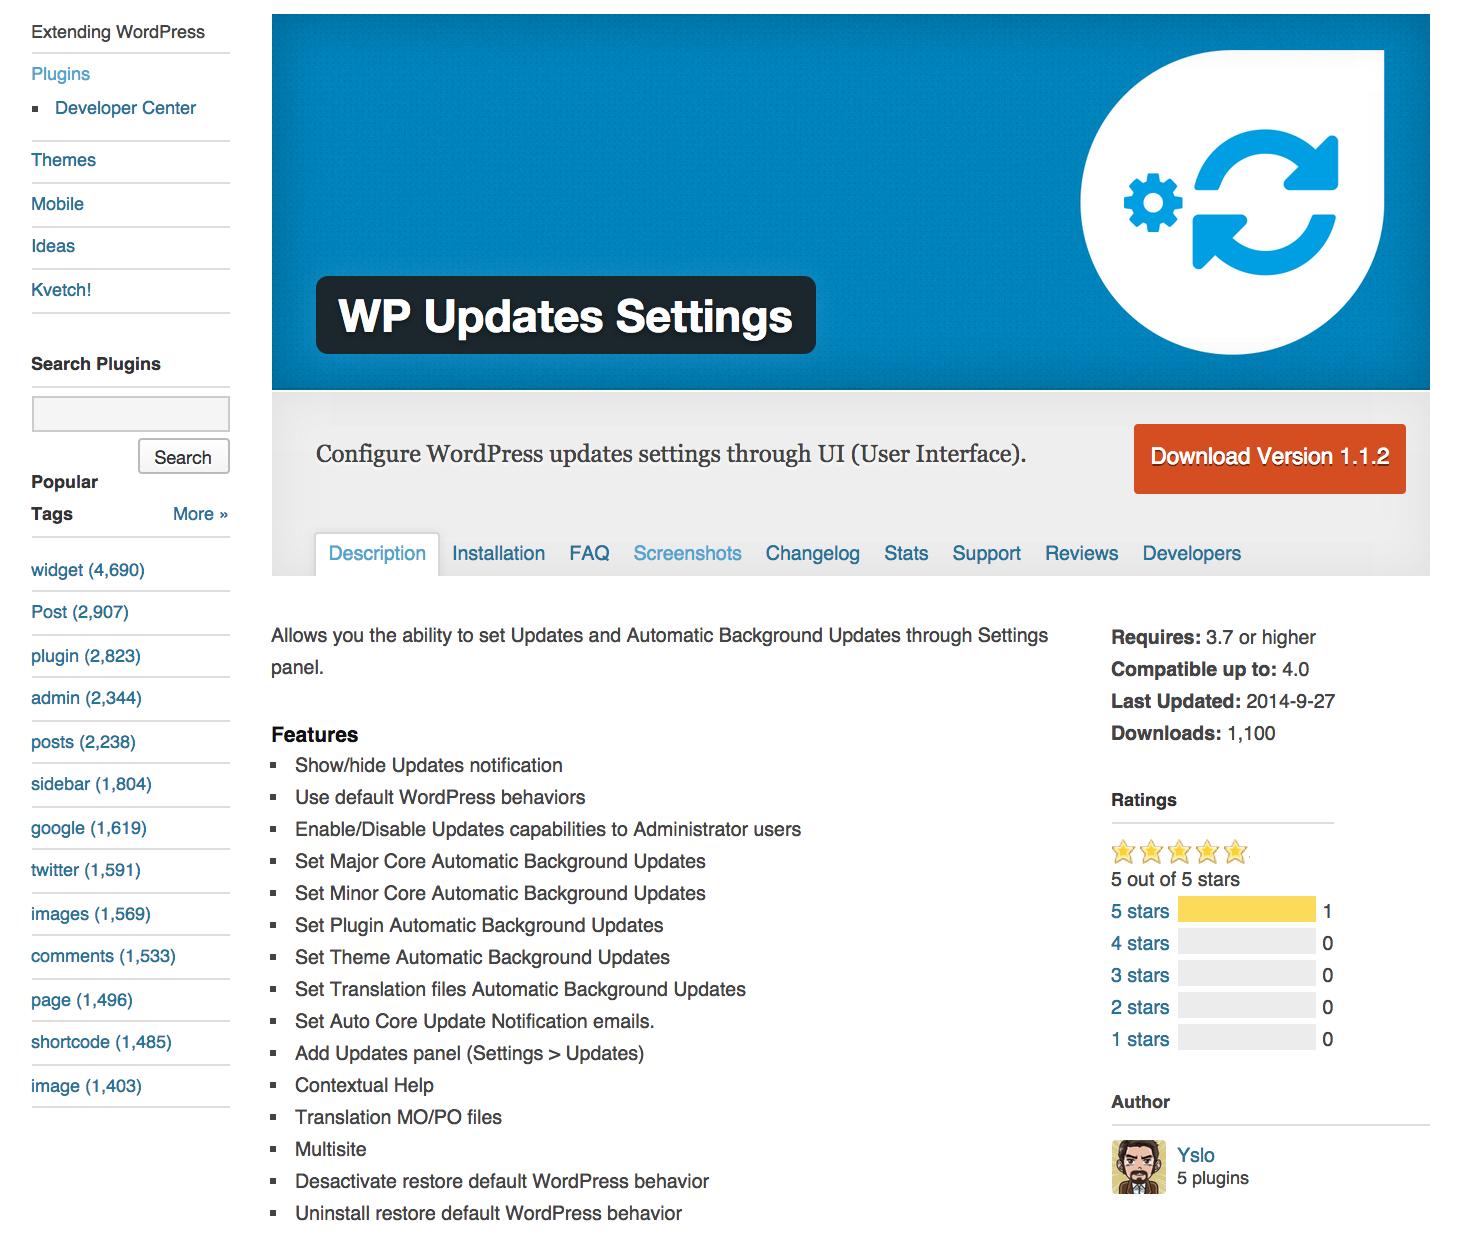 WP Updates Settings